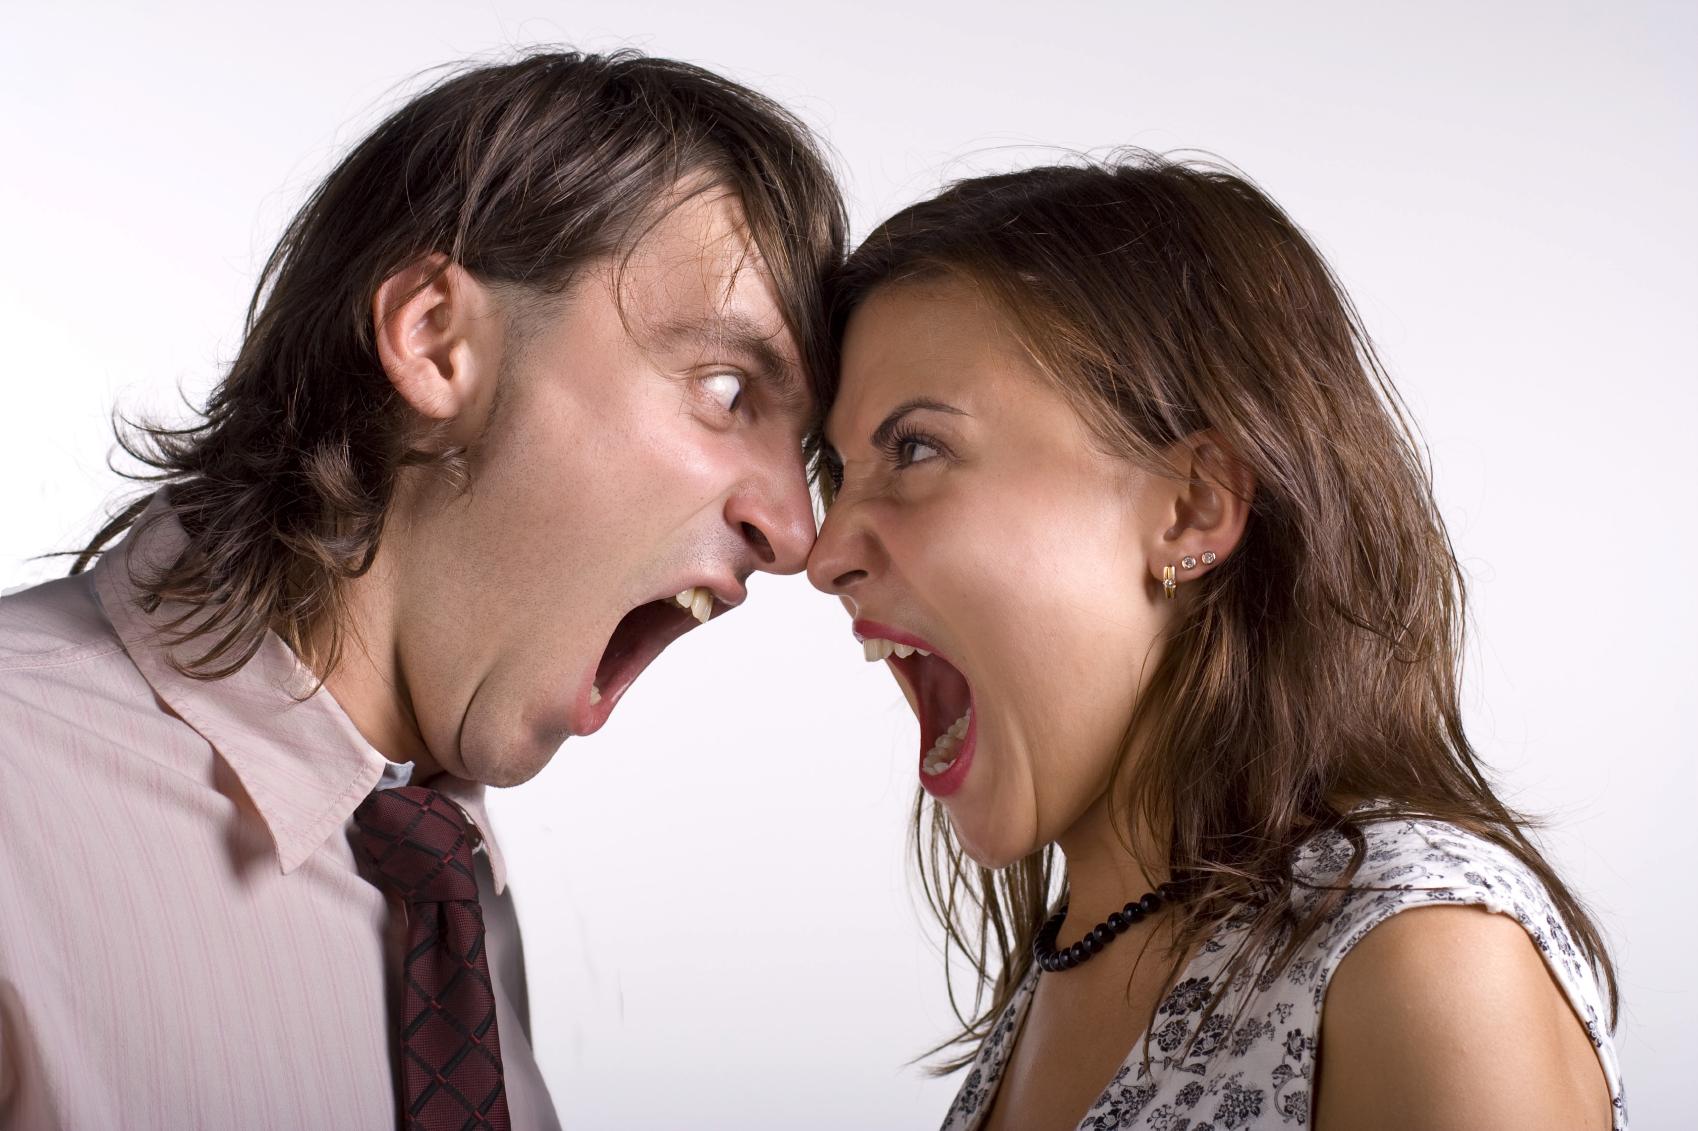 Quando ti arrabbi, gridi o taci? Cosa significa per la salute